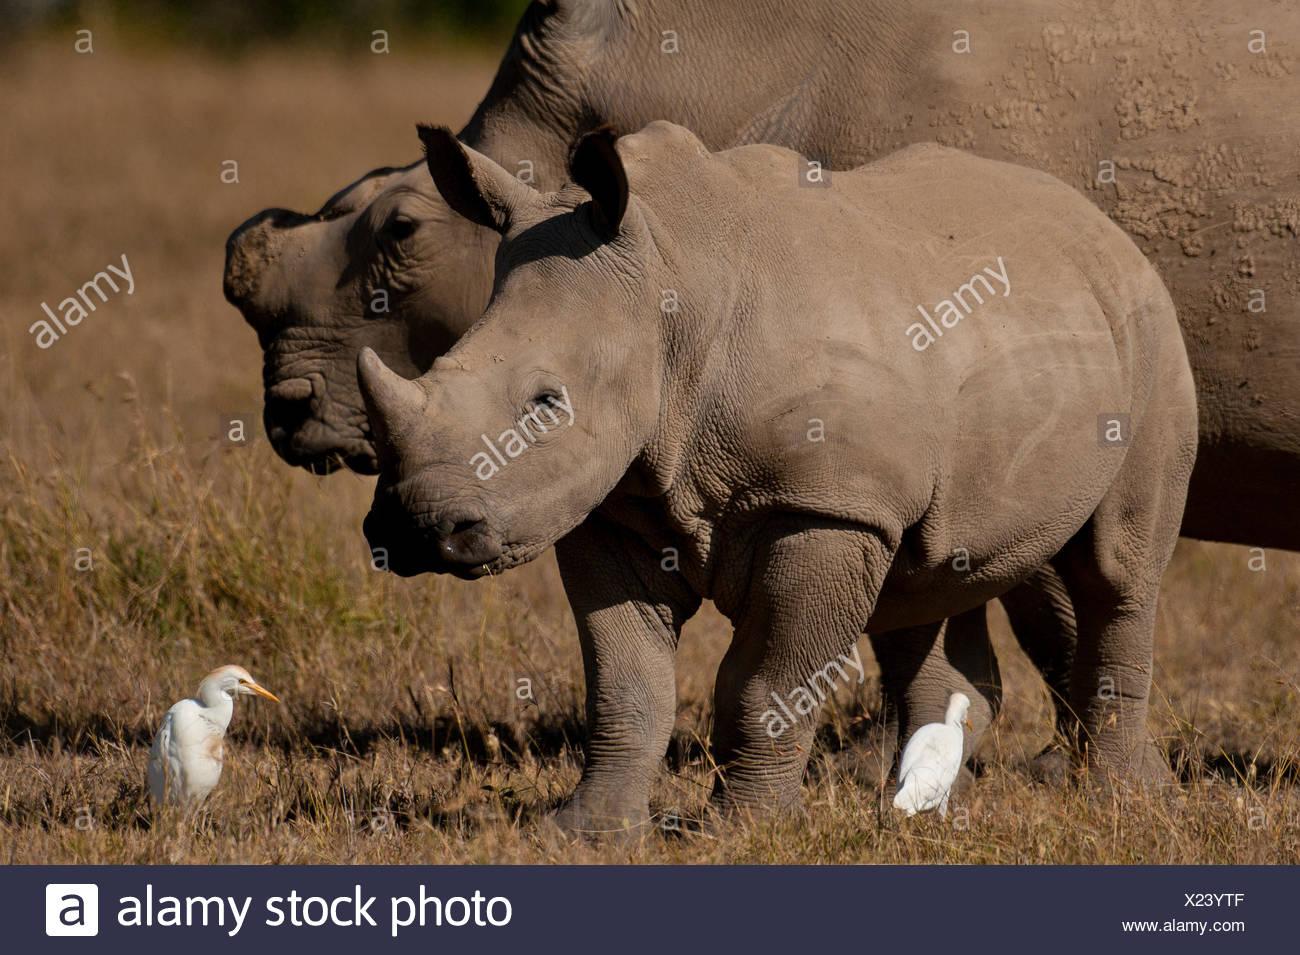 Southern White Rhino and baby in special rhino sancturay, Ol Pejeta Conservancy; Kenya - Stock Photo